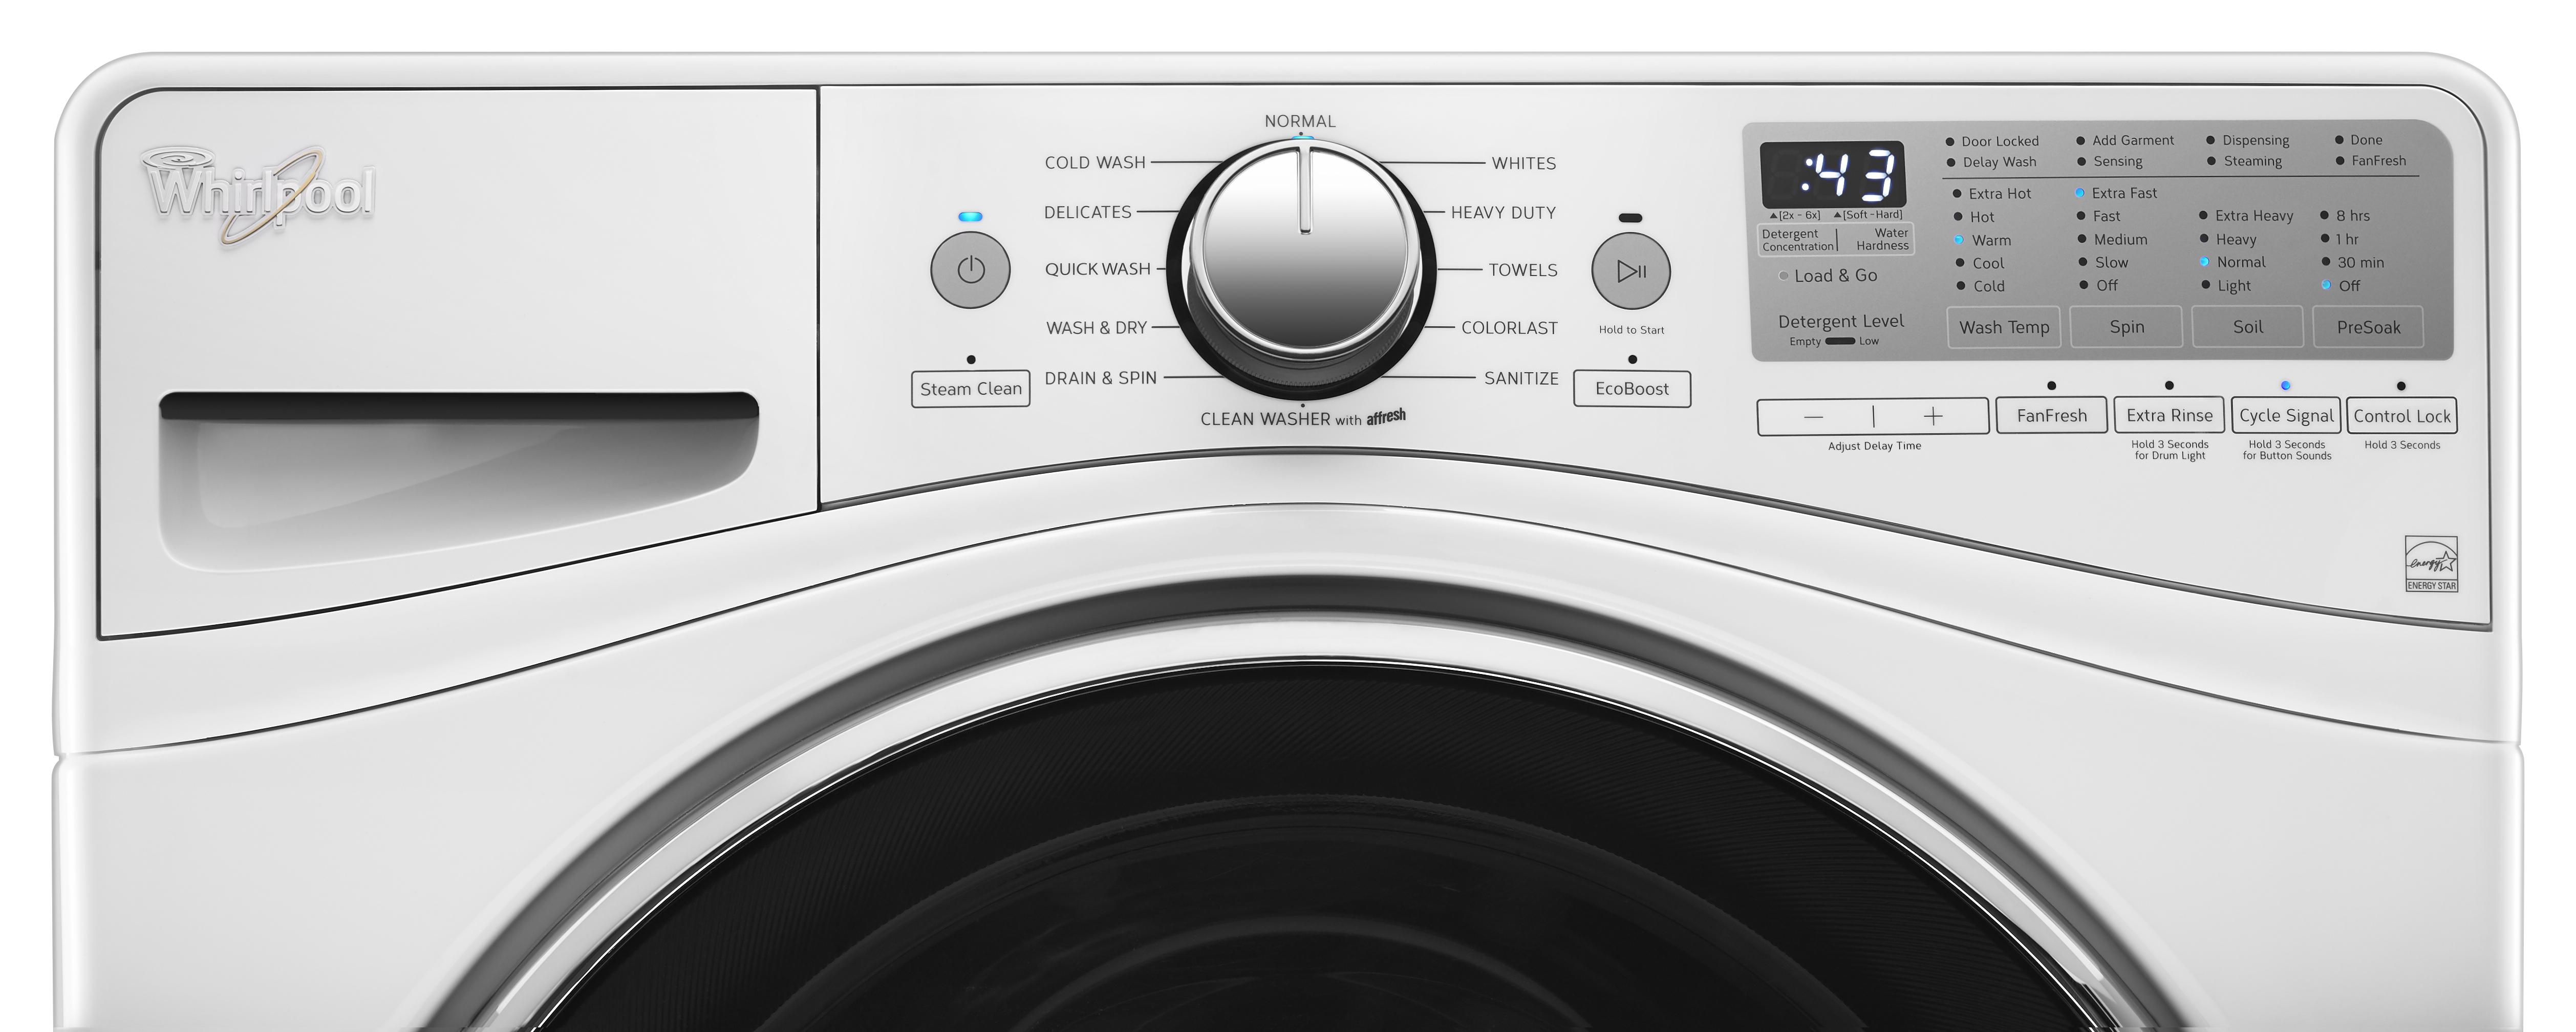 Whirlpool WED92HEFW 7.4 cu. ft. Electric Dryer w/ Advanced Moisture Sensing - White